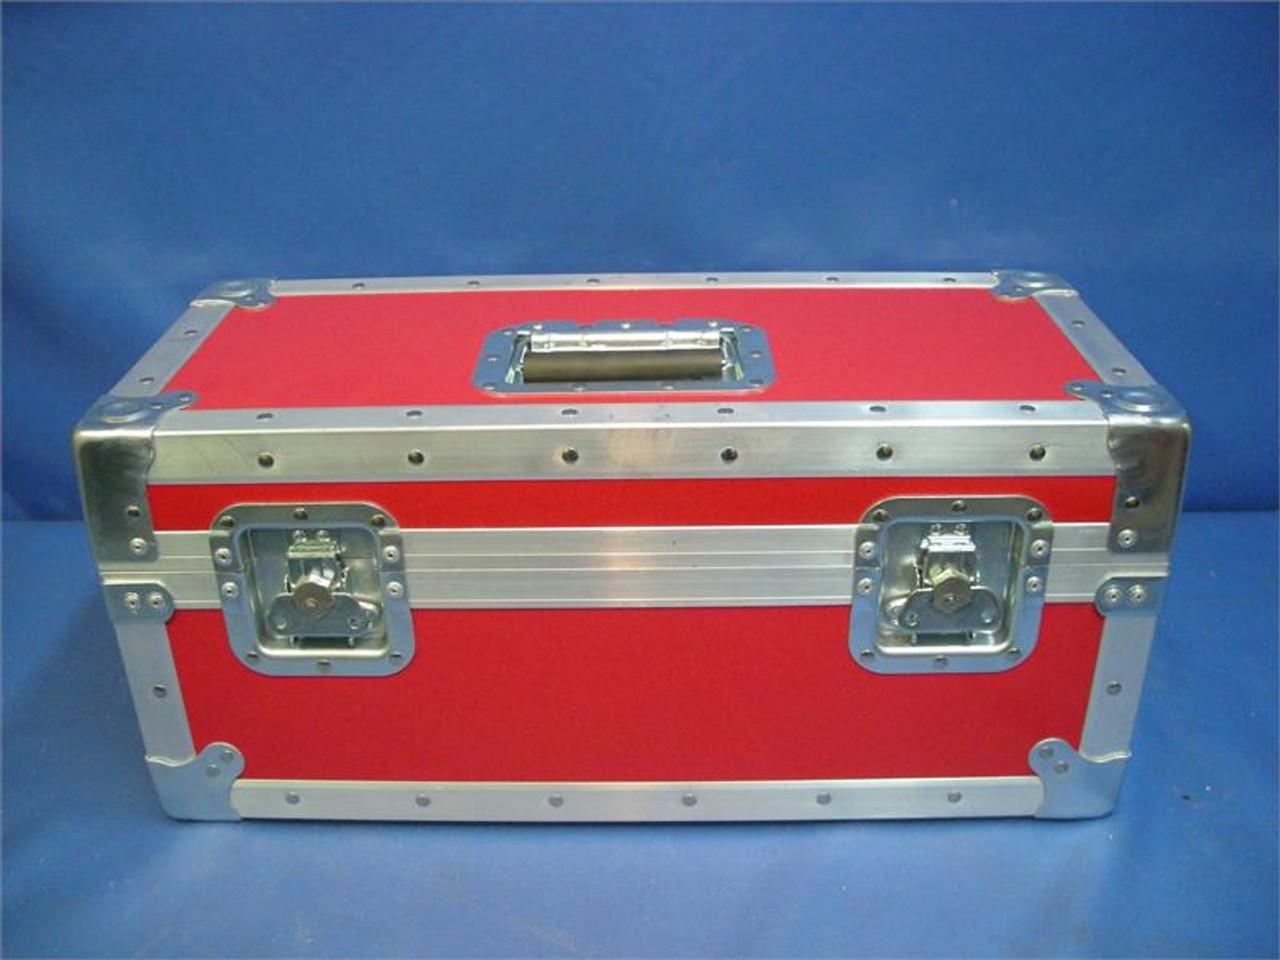 6K Light Bulb Custom ATA Shipping Case - Exterior View